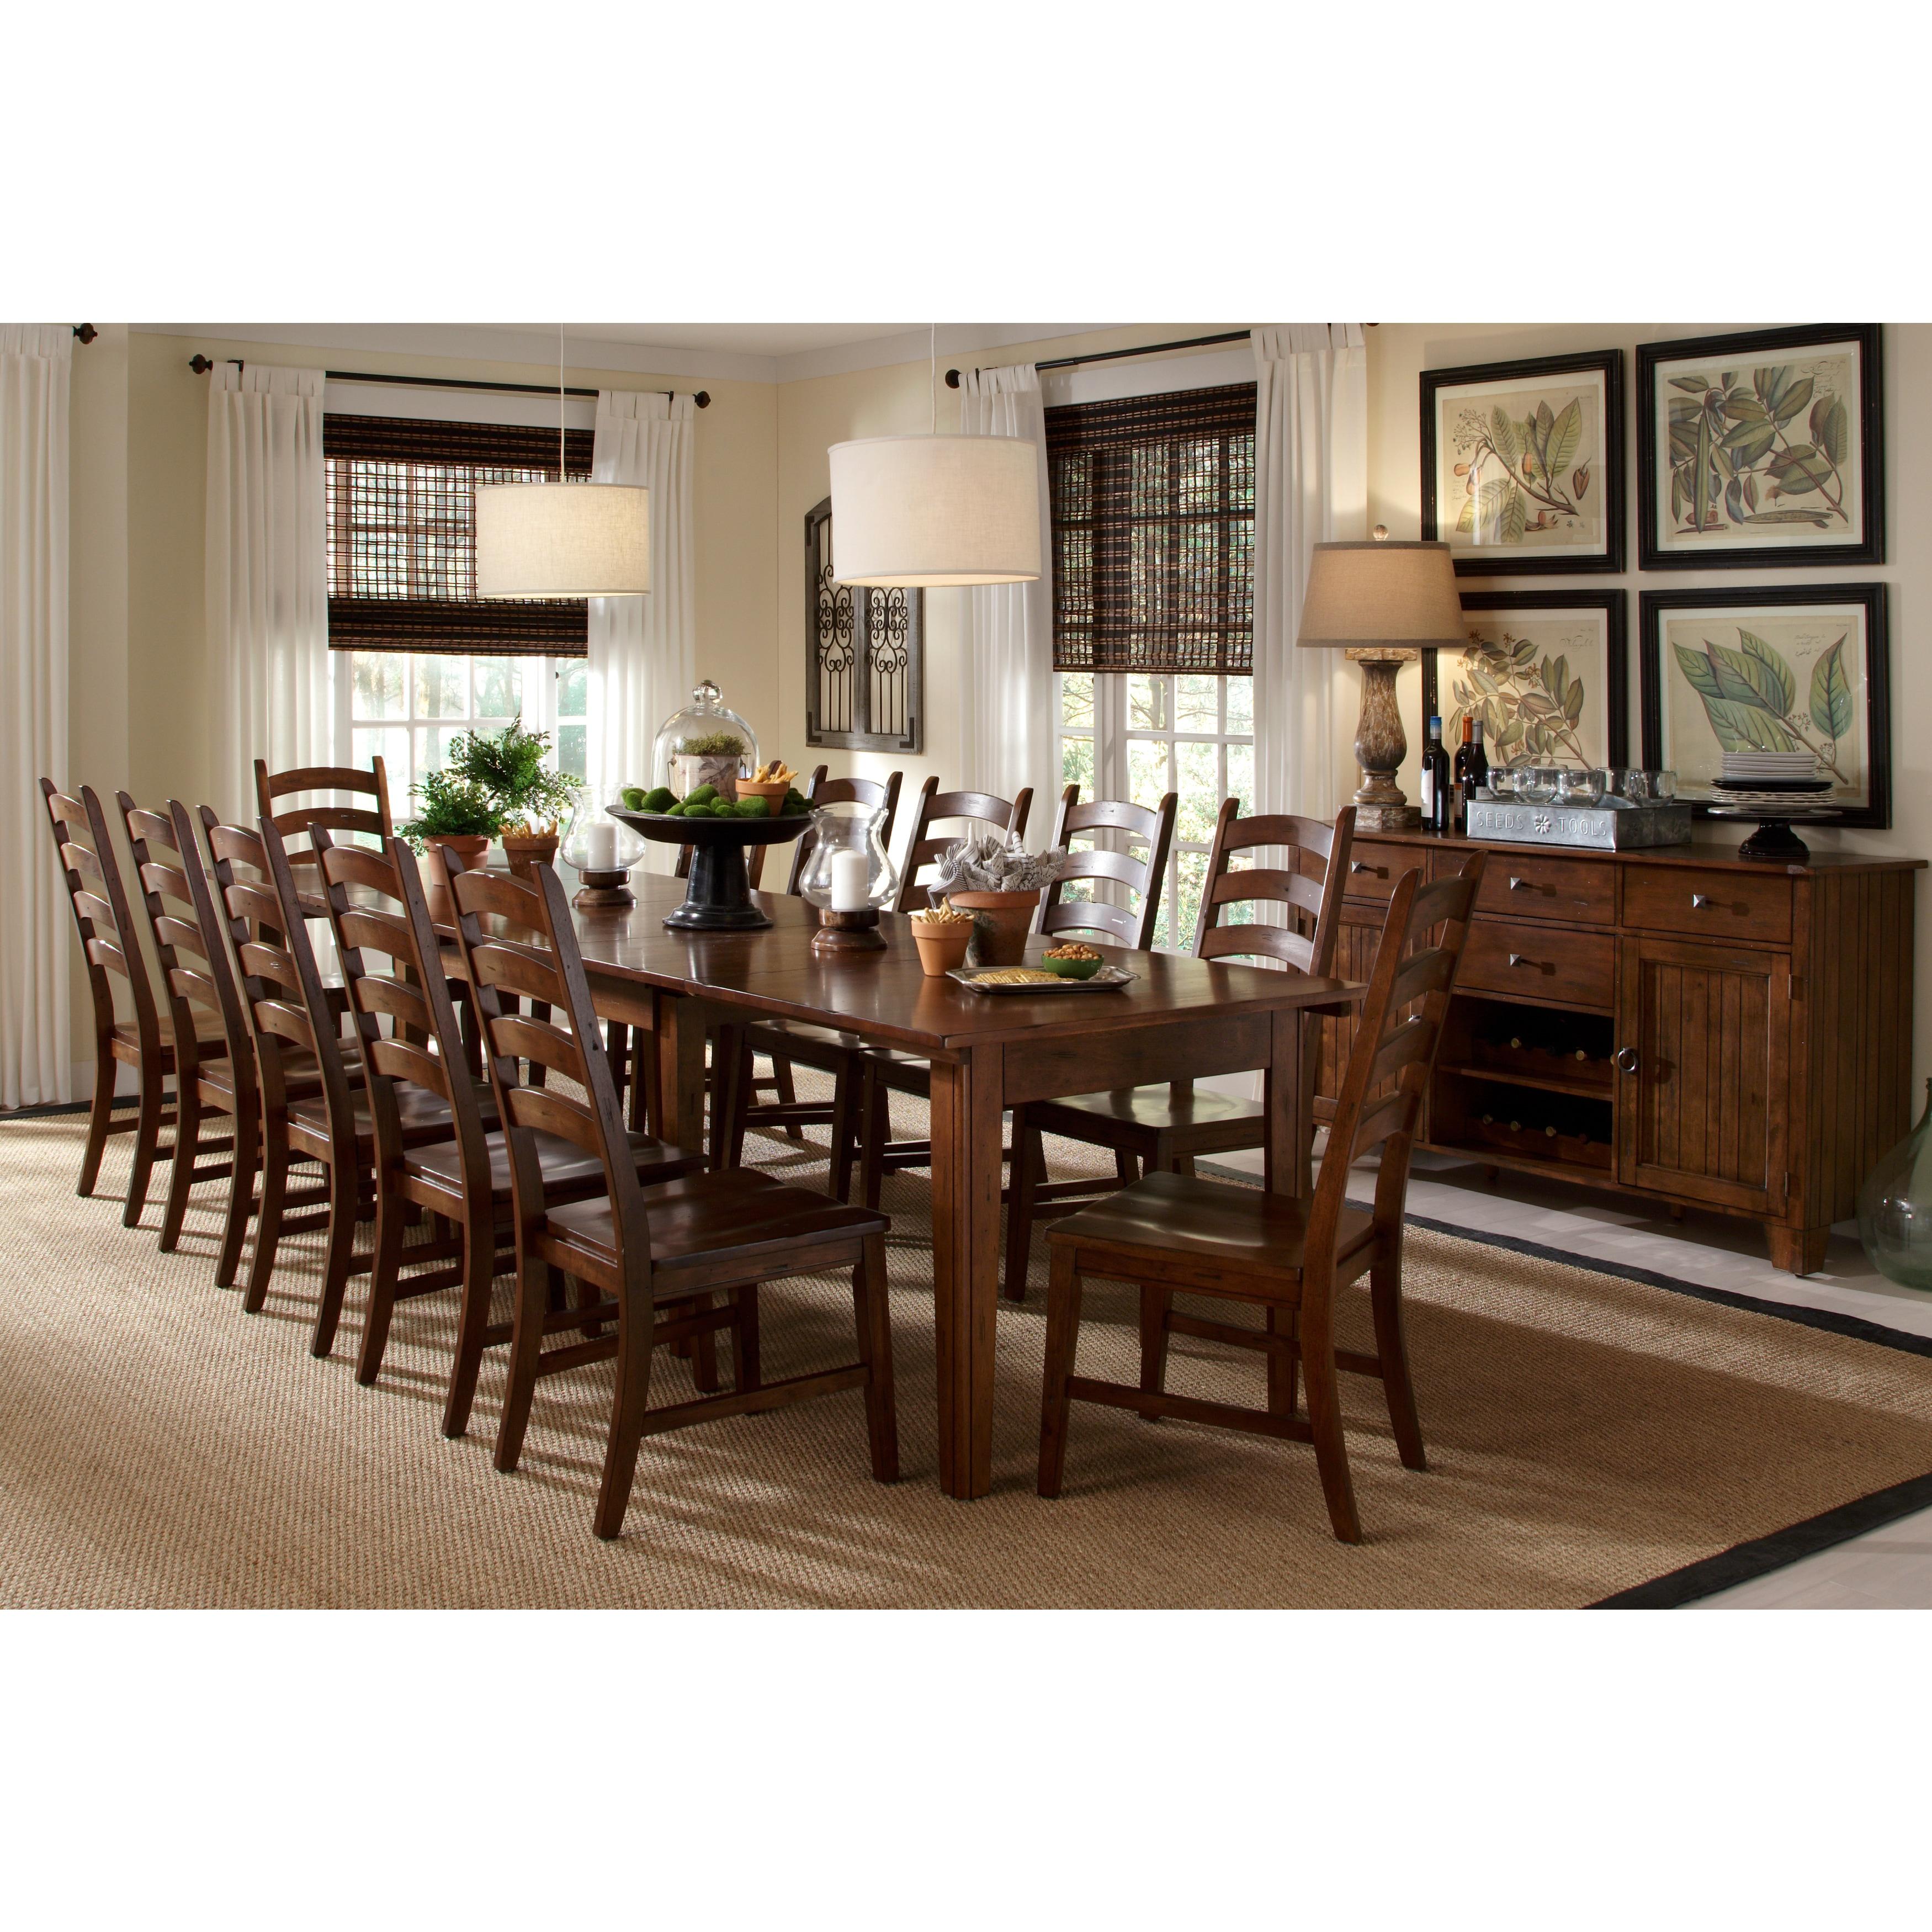 Buy 12-Piece Sets Kitchen & Dining Room Sets Online at ...